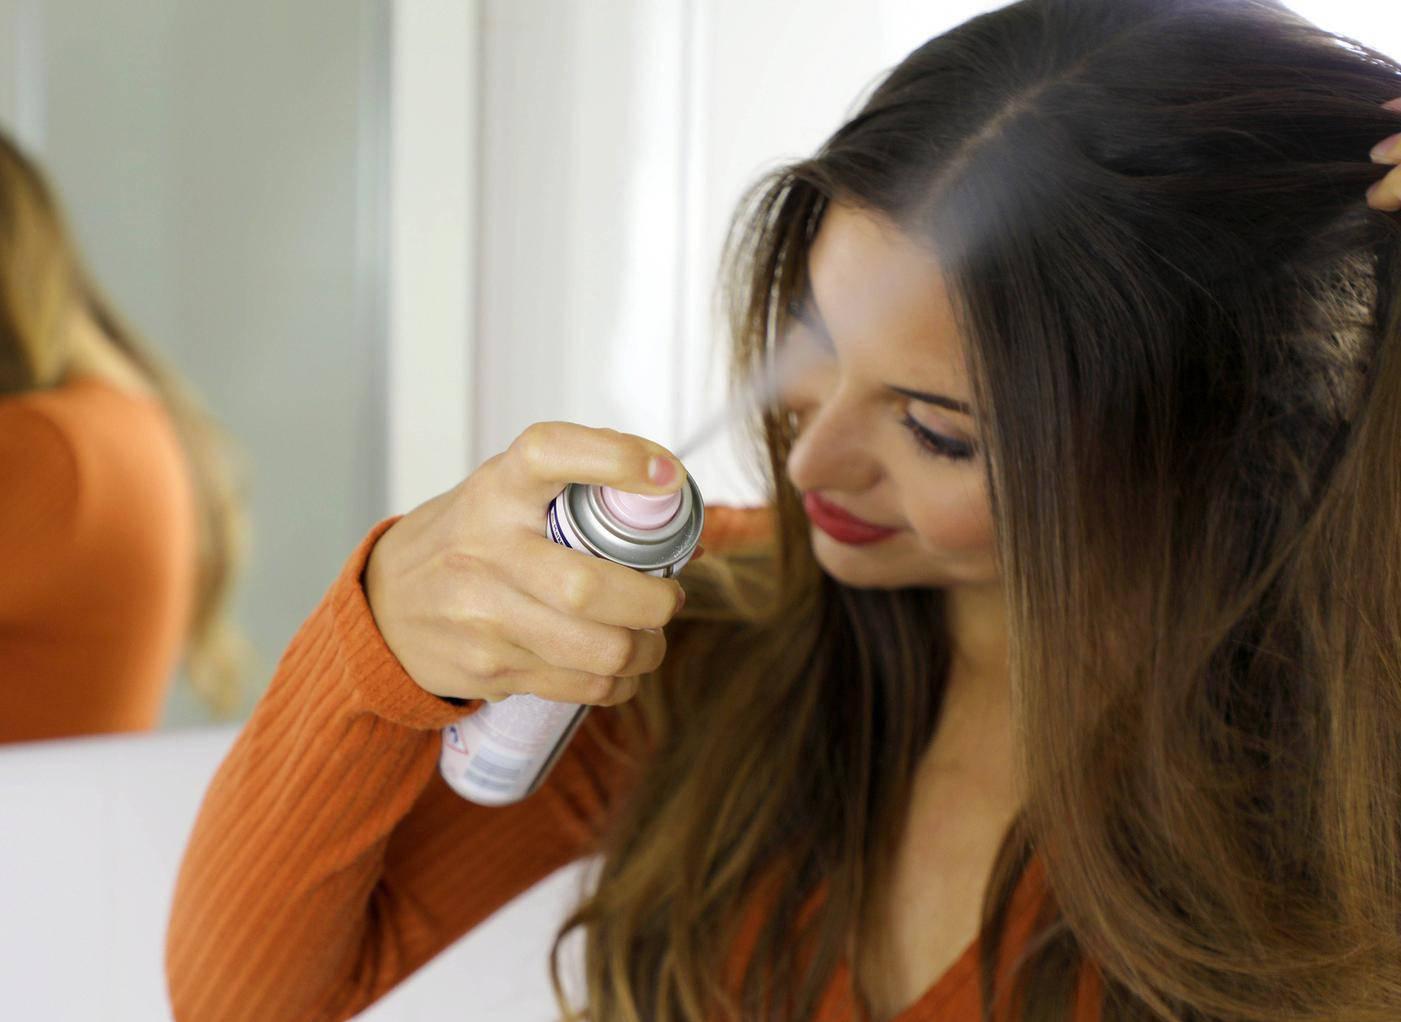 Šampon za suho pranje: Pravila za korištenje koje morate znati